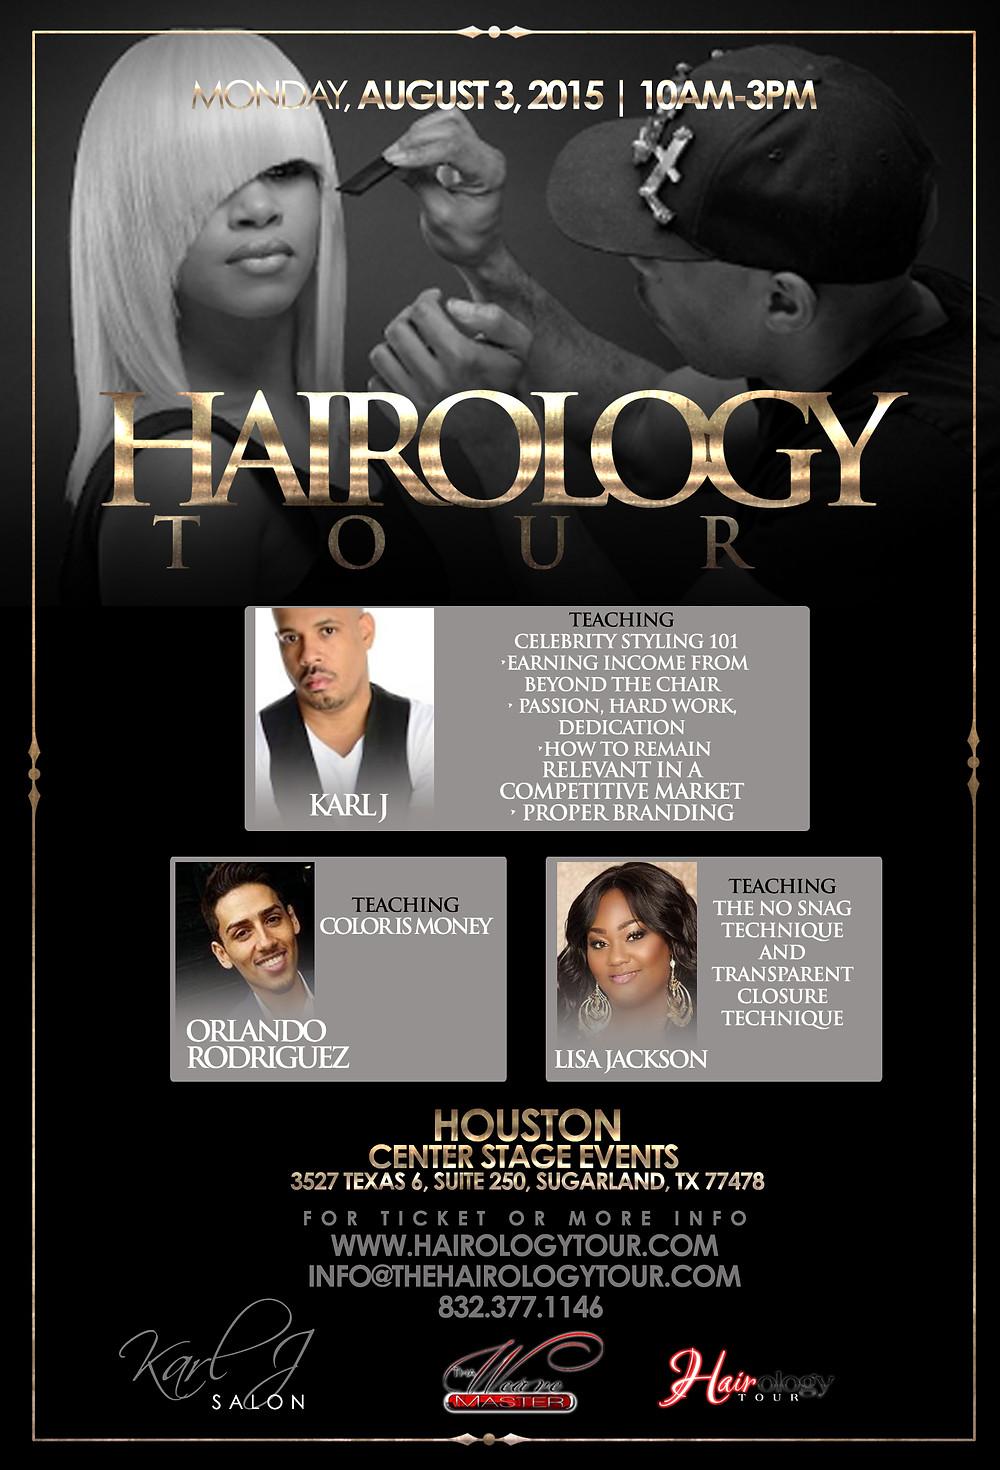 Hairology Tour with Celebrity Hair Stylist Karl J